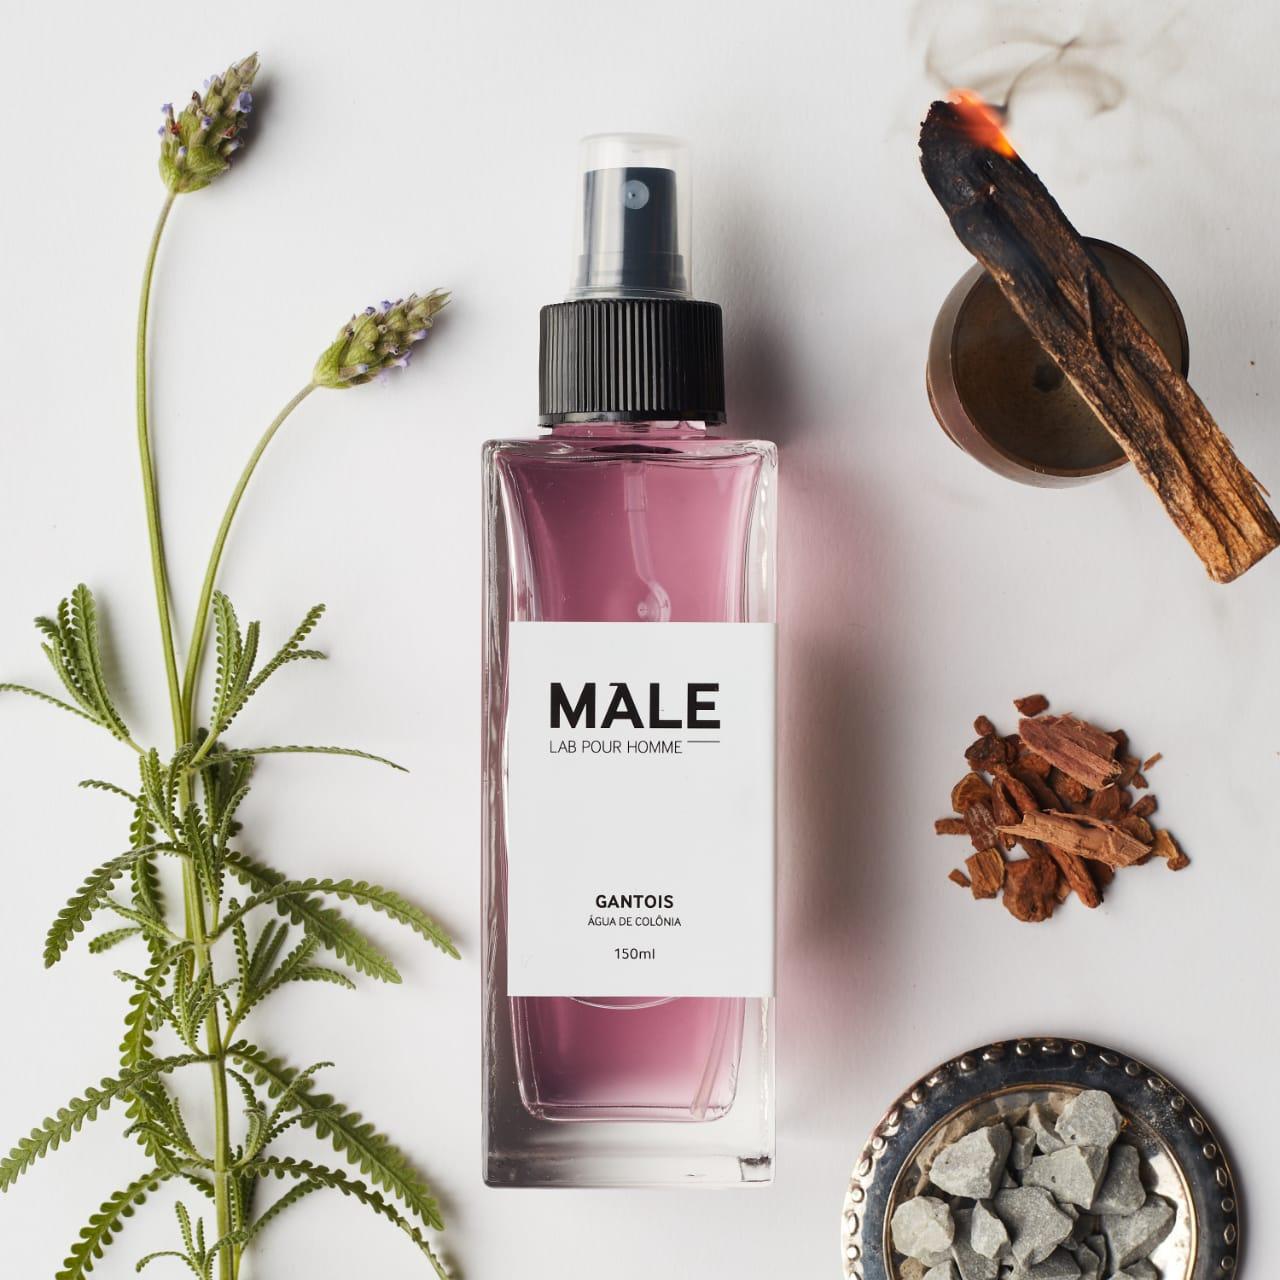 Perfume Gantois (150ml) | Male Lab Pour Homme